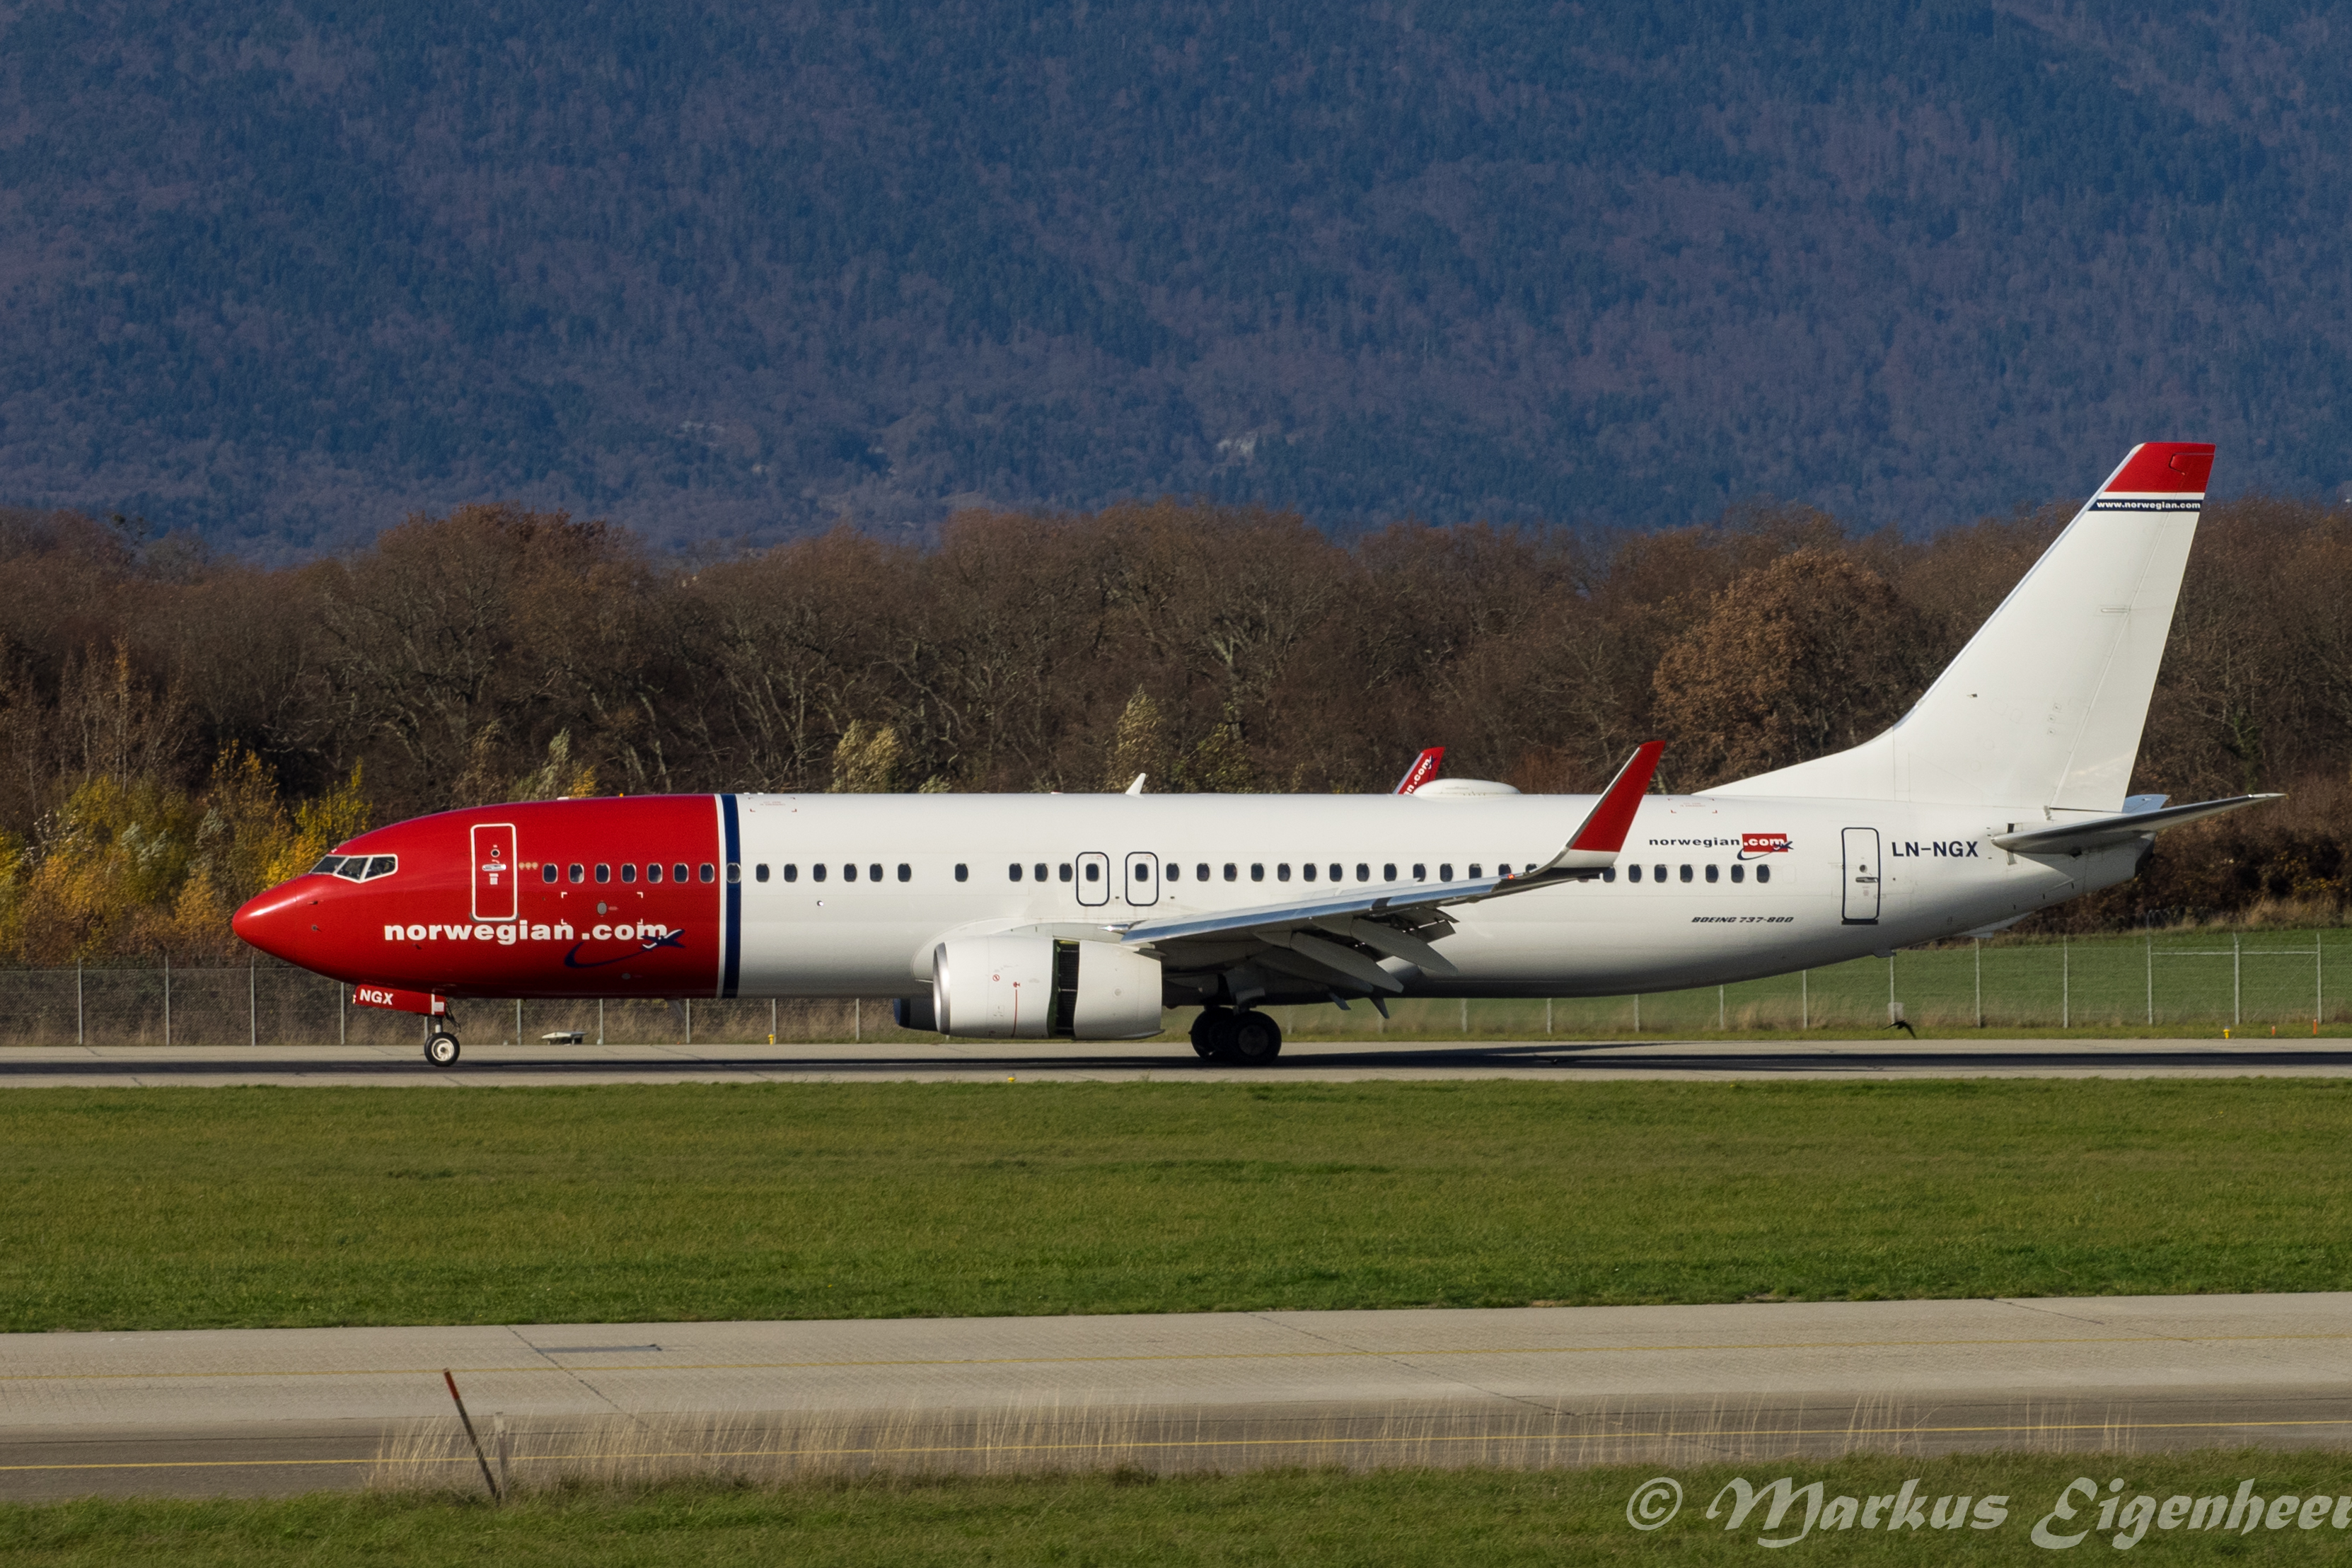 File:LN-NGX Boeing B737-8JP-W B738 - NAX (22778658917) jpg